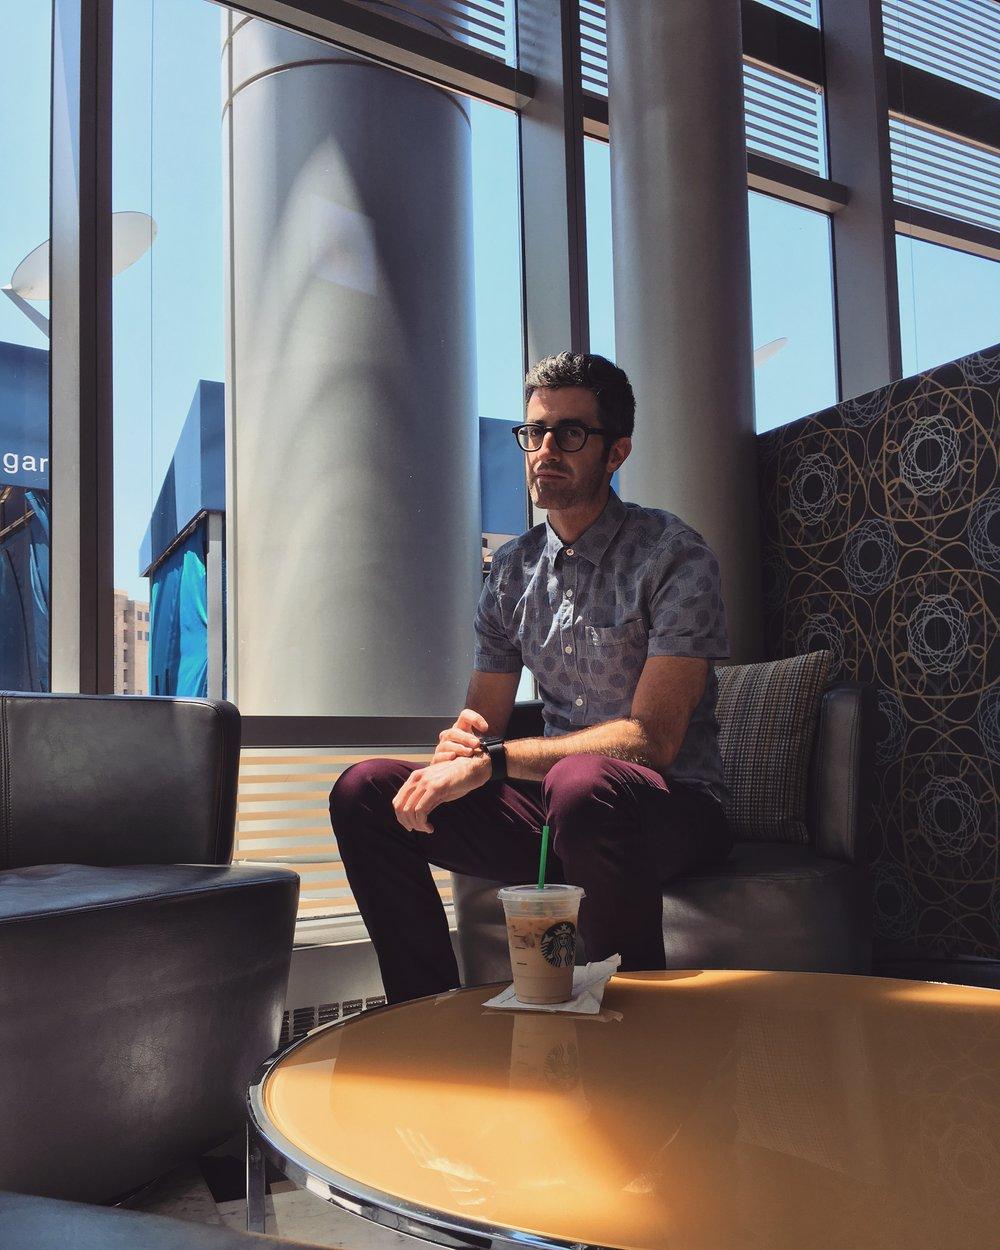 #applewatchselfie: JW Starbucks